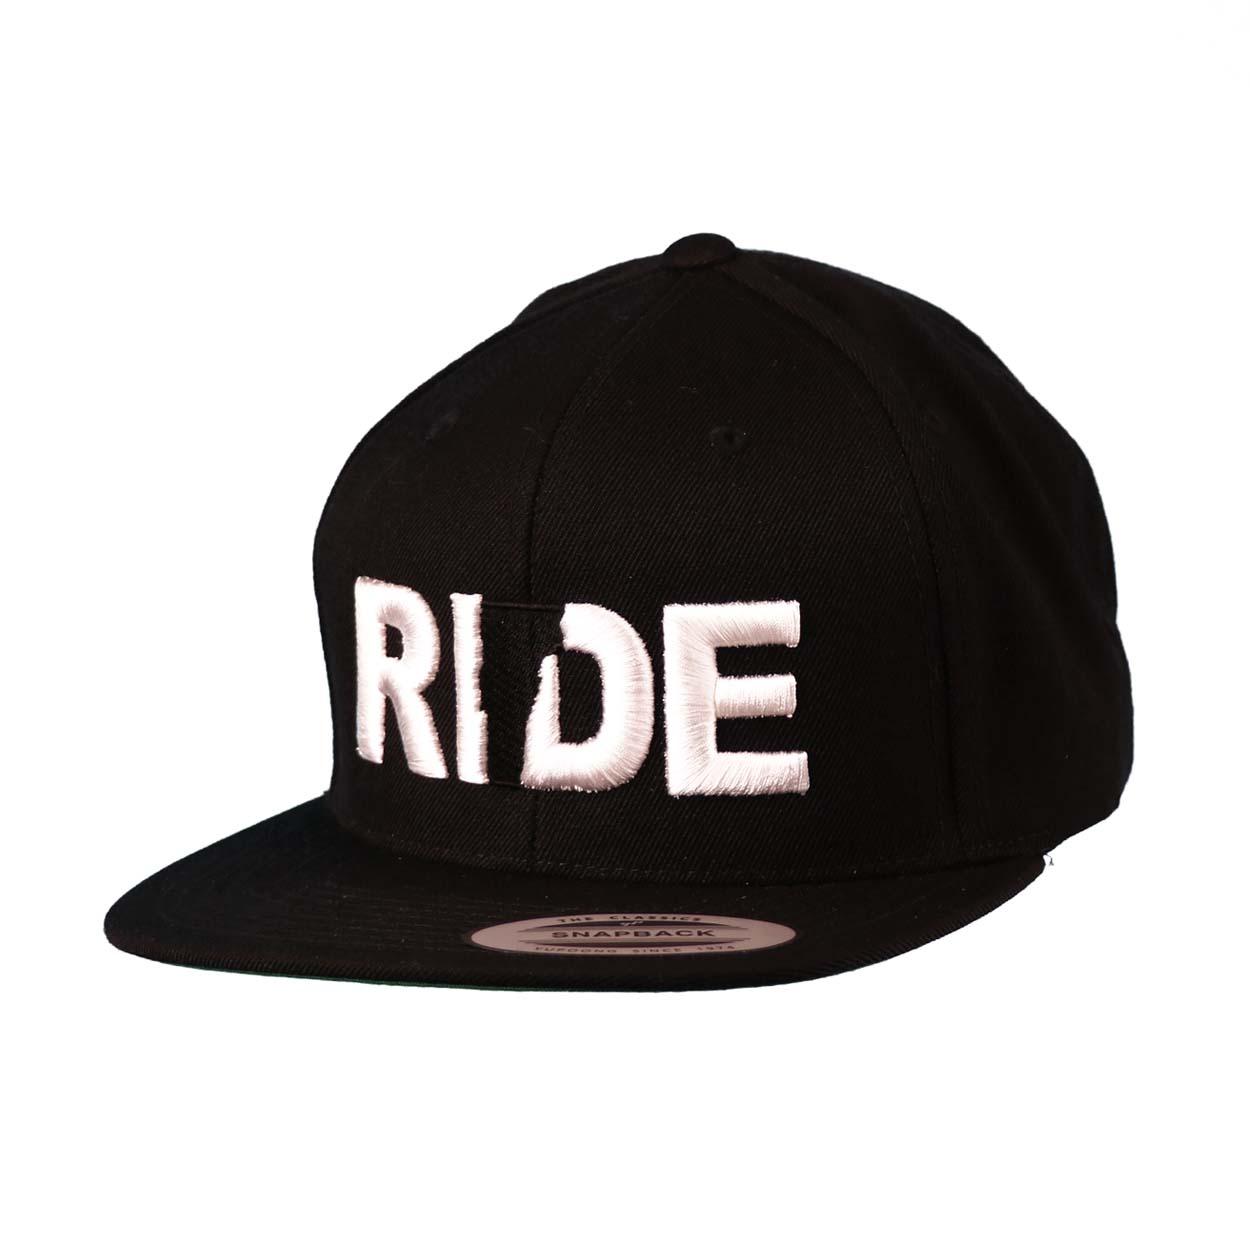 Ride Vermont Classic Embroidered  Snapback Flat Brim Hat Black/White